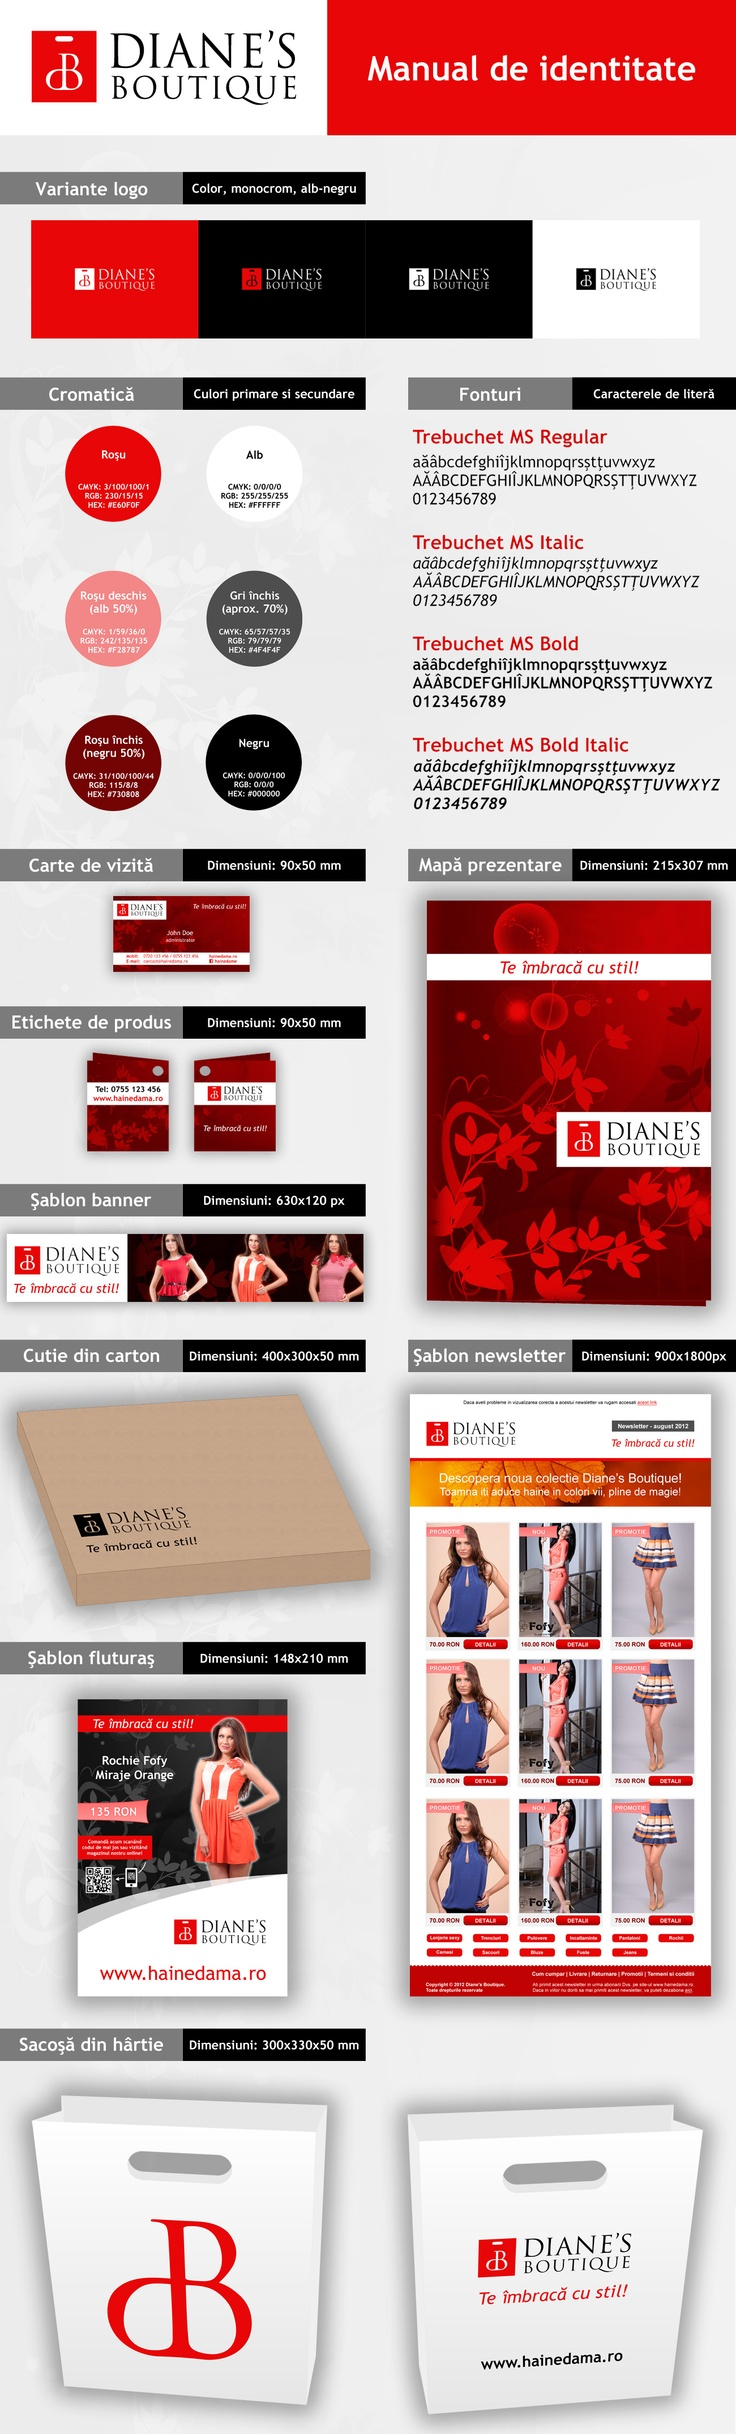 [RO] Diane's Boutique - identitate vizuală [EN] Diane's Boutique - visual identity  Made for our partners: InnoWEB & WebConnect